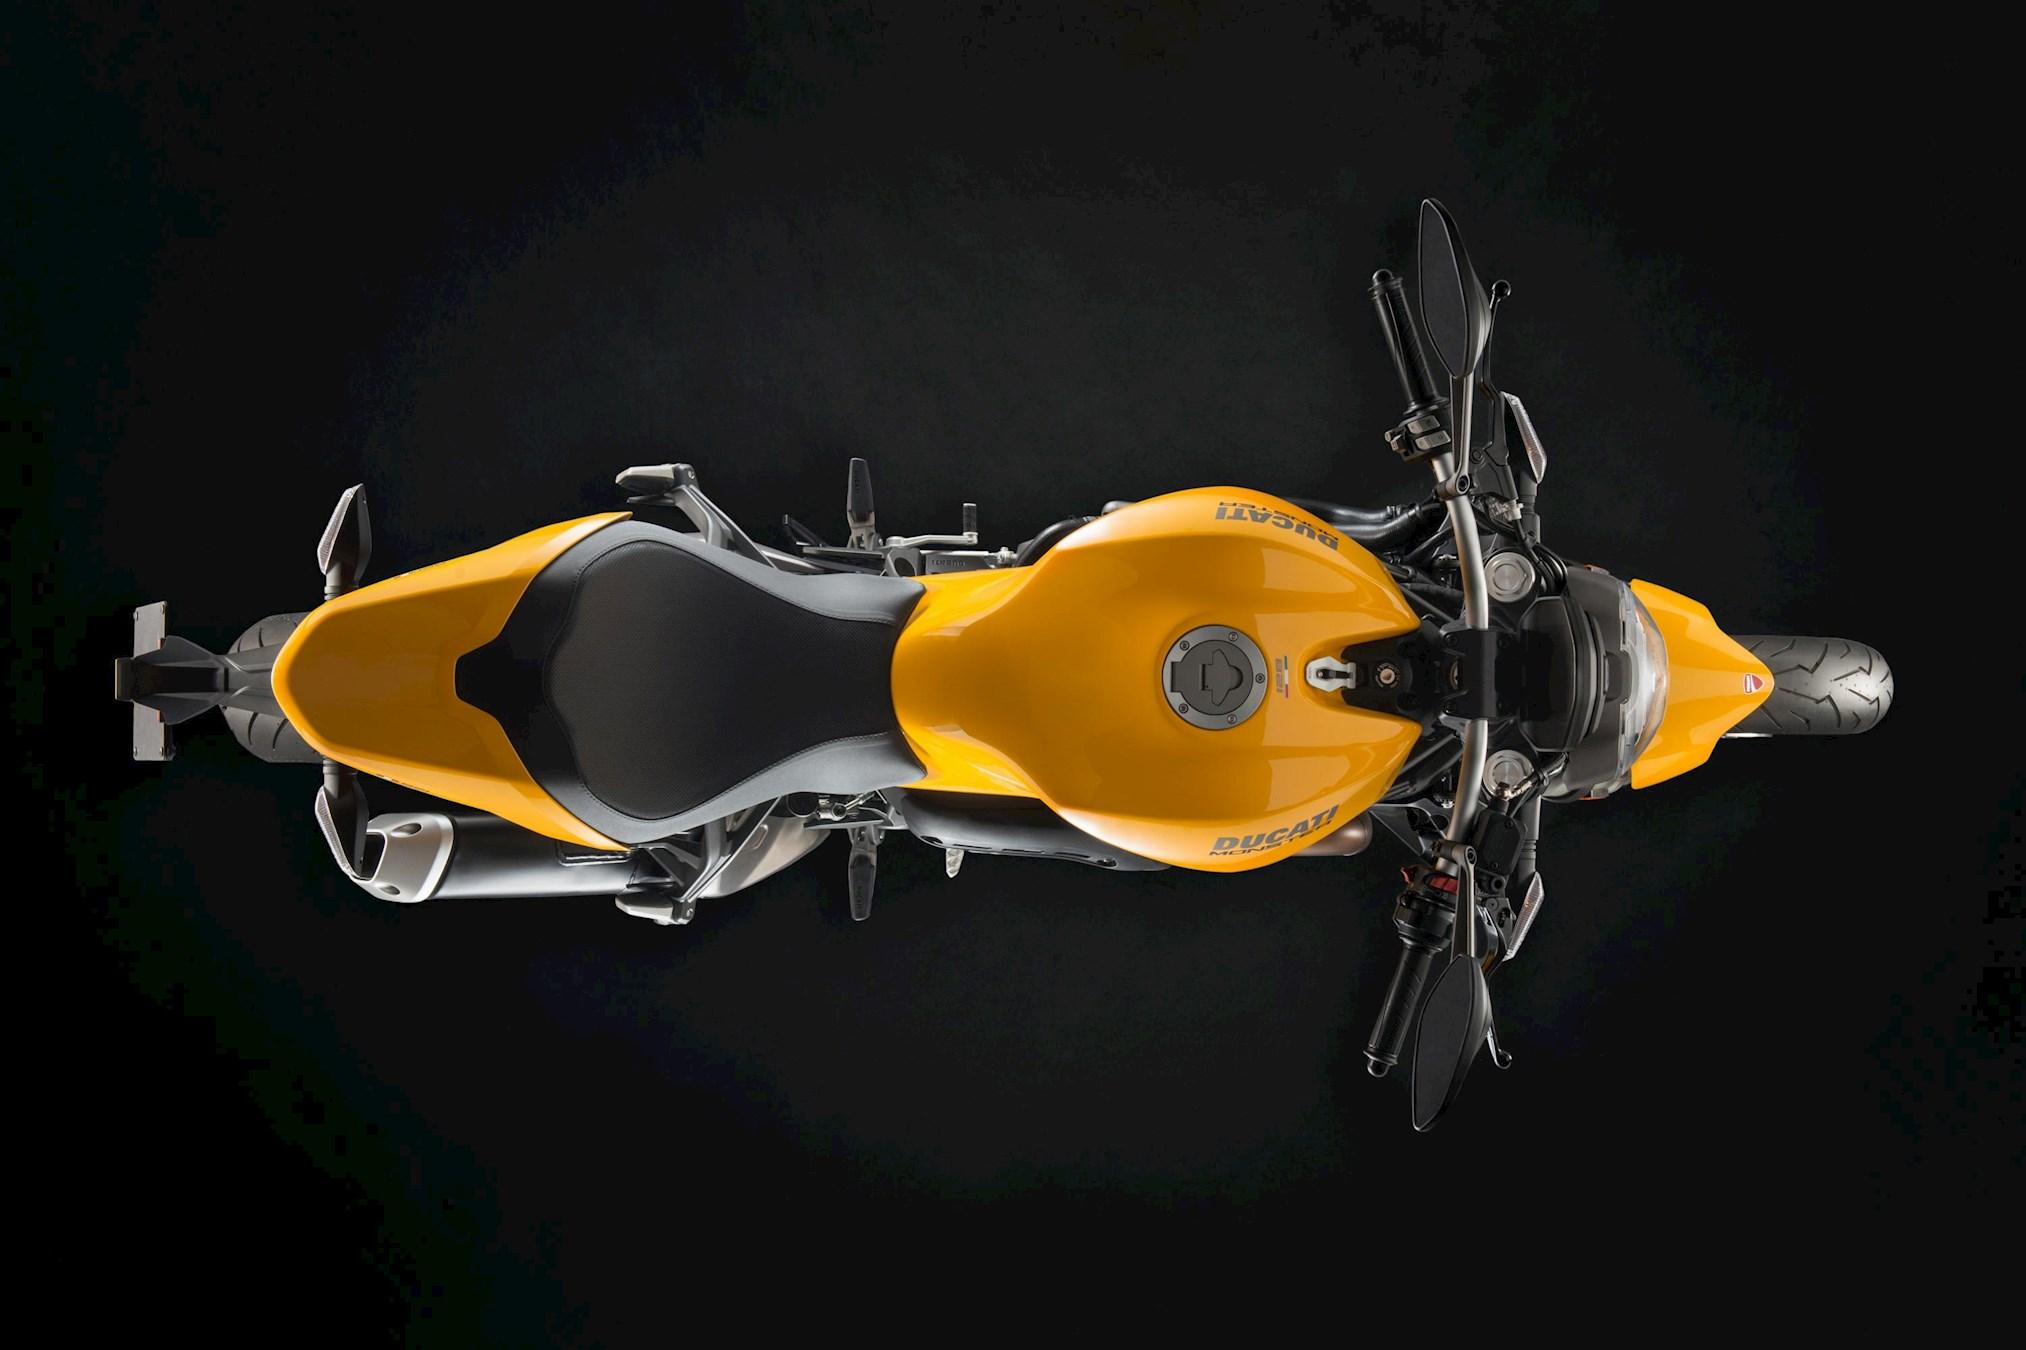 МОТОЦИКЛ DUCATI MONSTER 821 2018 ― Артмото - купить квадроцикл в украине и харькове, мотоцикл, снегоход, скутер, мопед, электромобиль